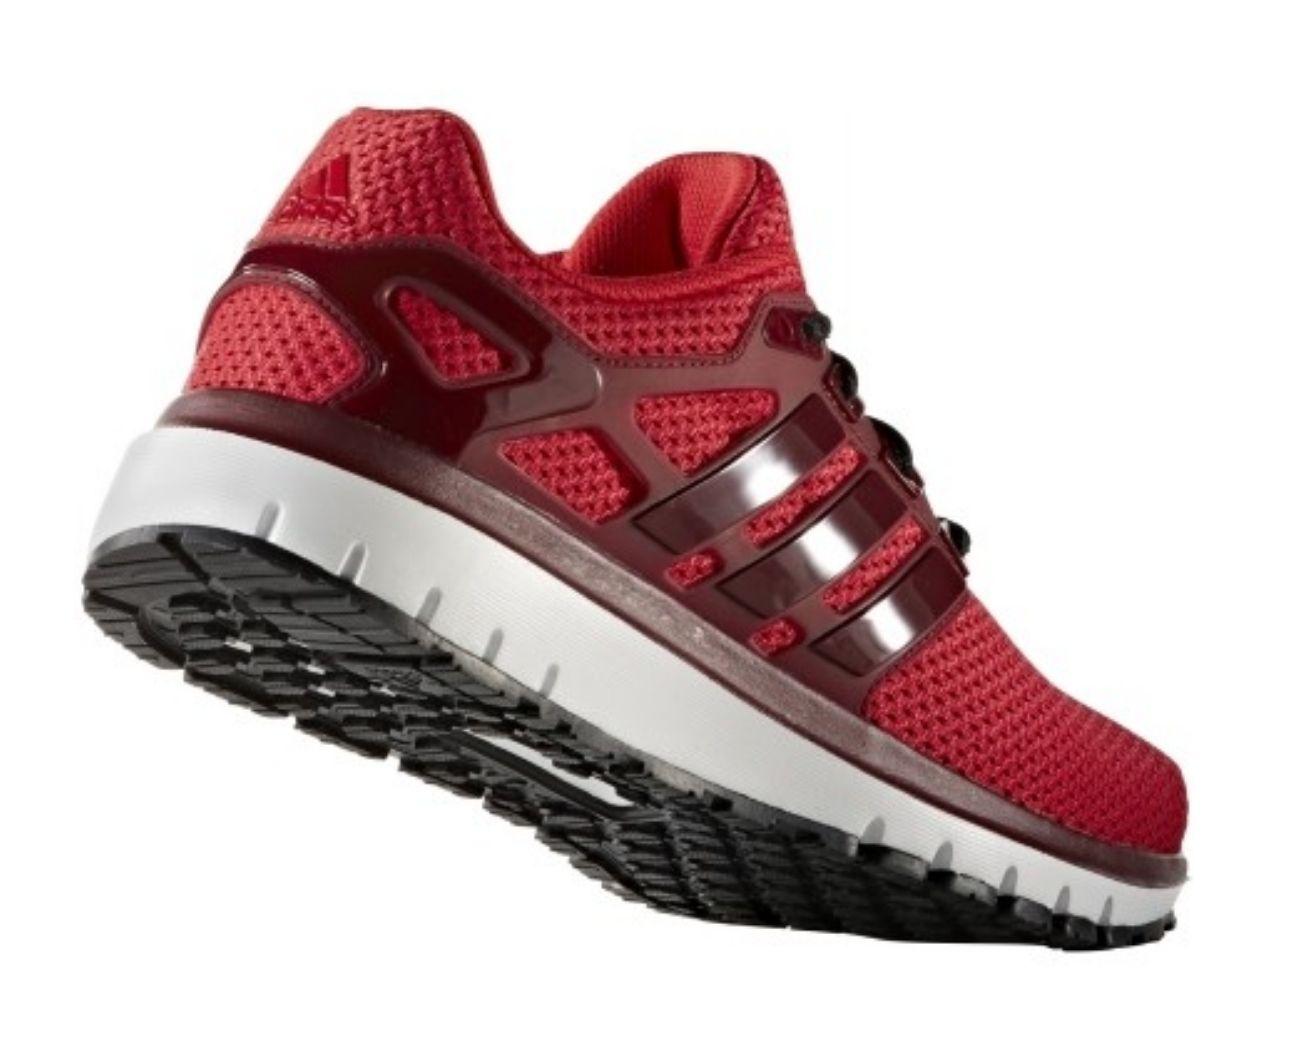 Buty do biegania męskie ADIDAS Energy CLOUD M